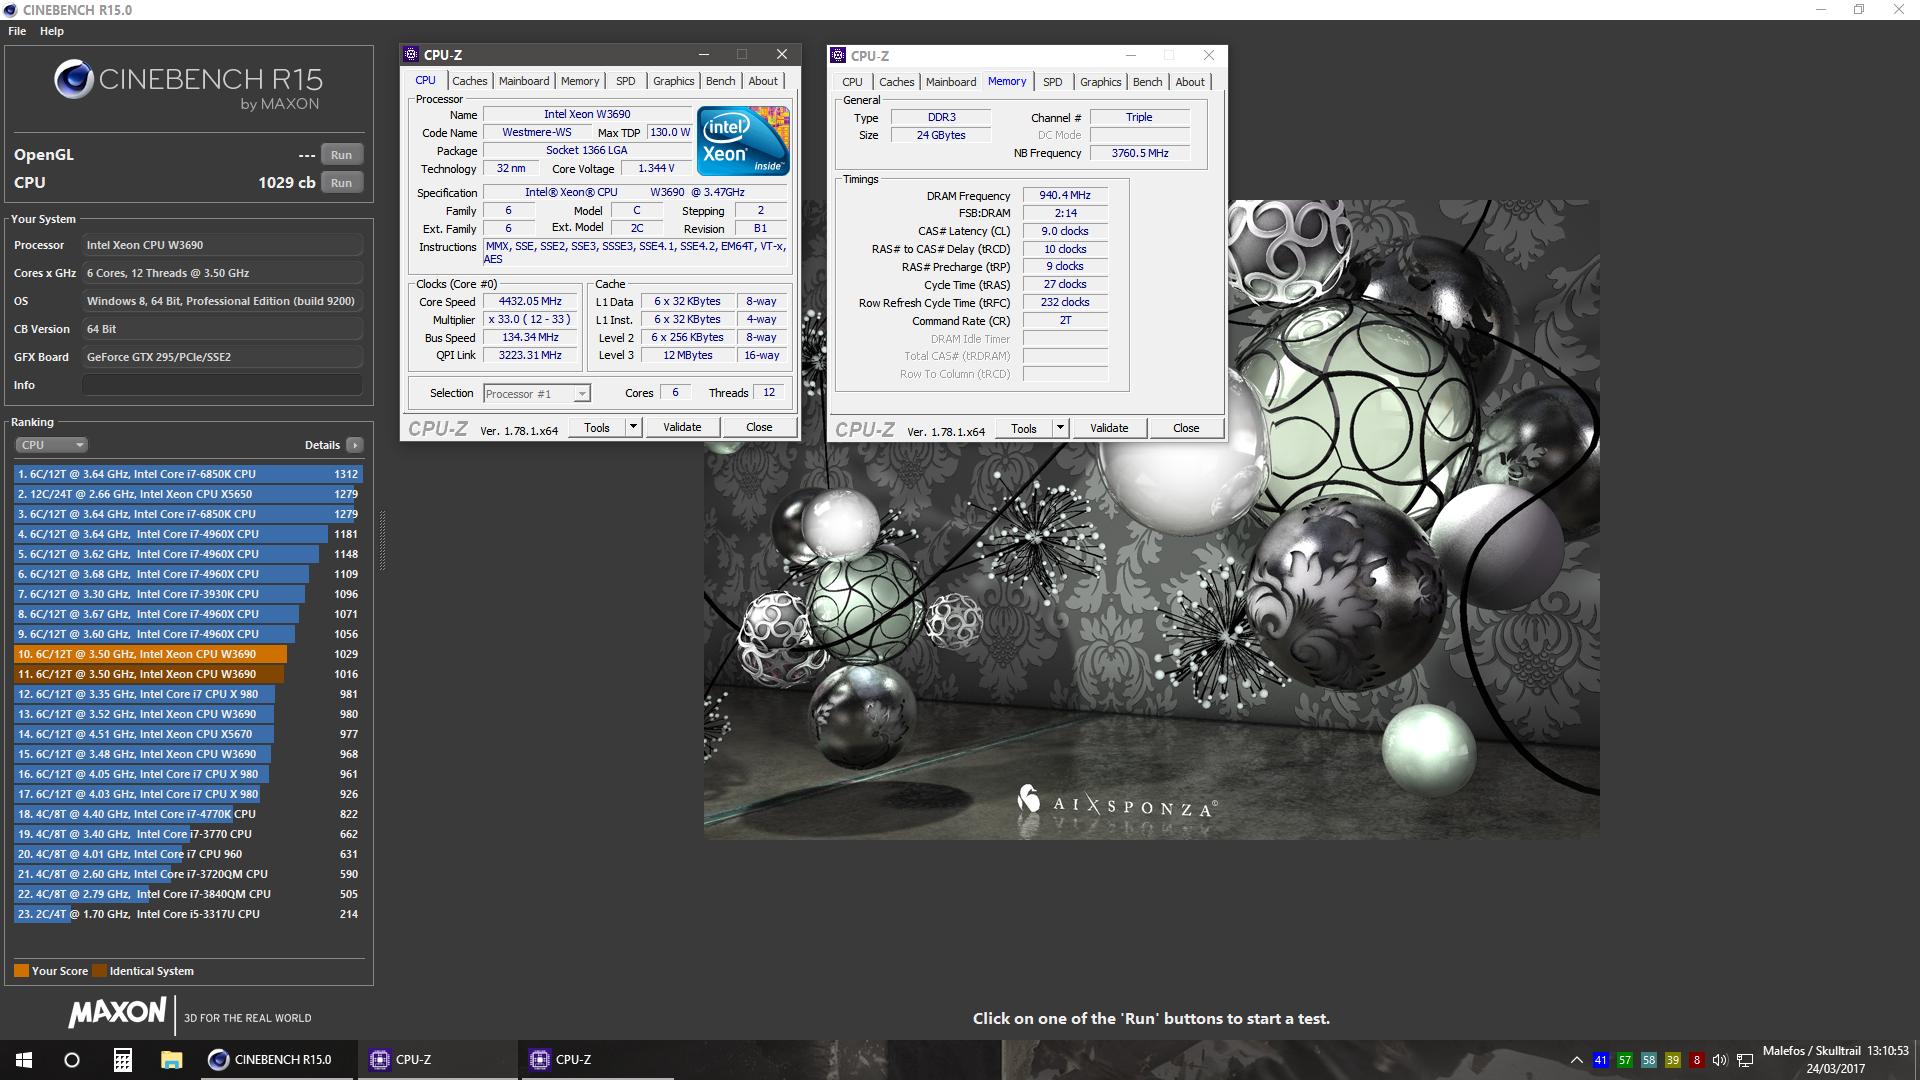 Skulltrail_BR`s Cinebench - R15 score: 1029 cb with a Xeon W3690